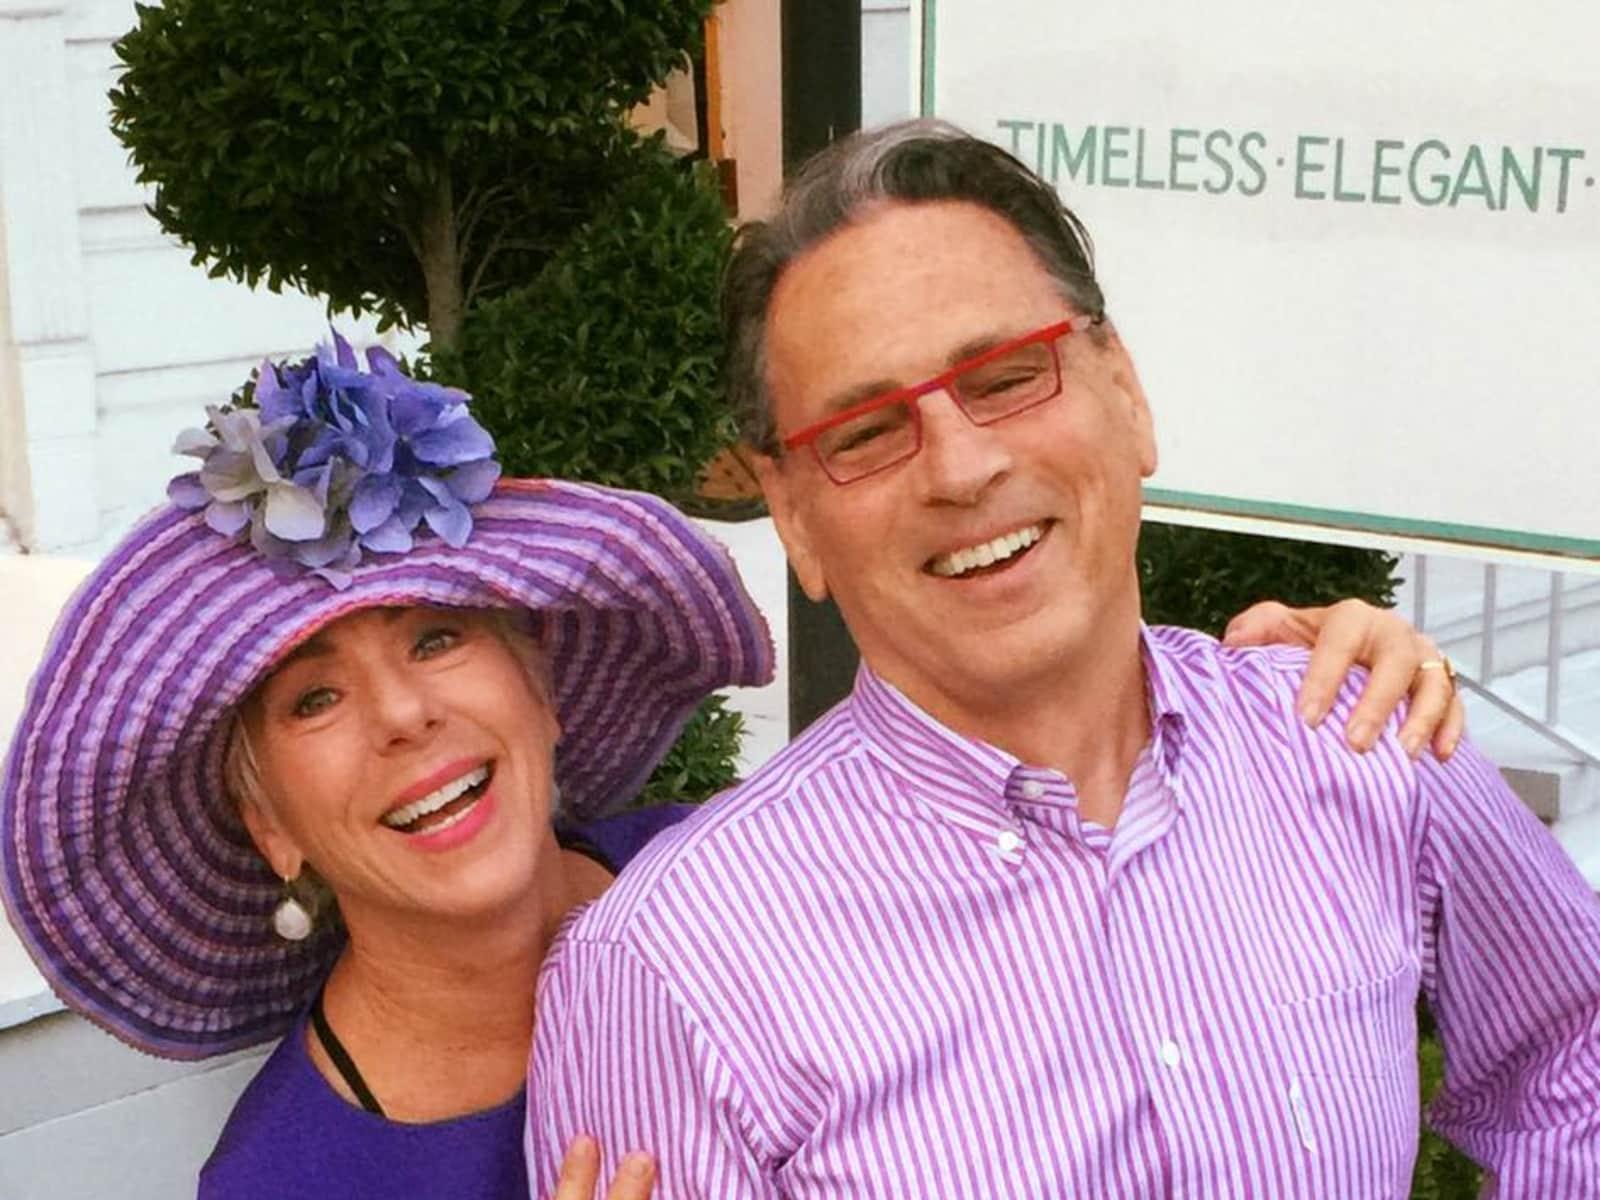 Hattie & Bruce from Nashville, Tennessee, United States